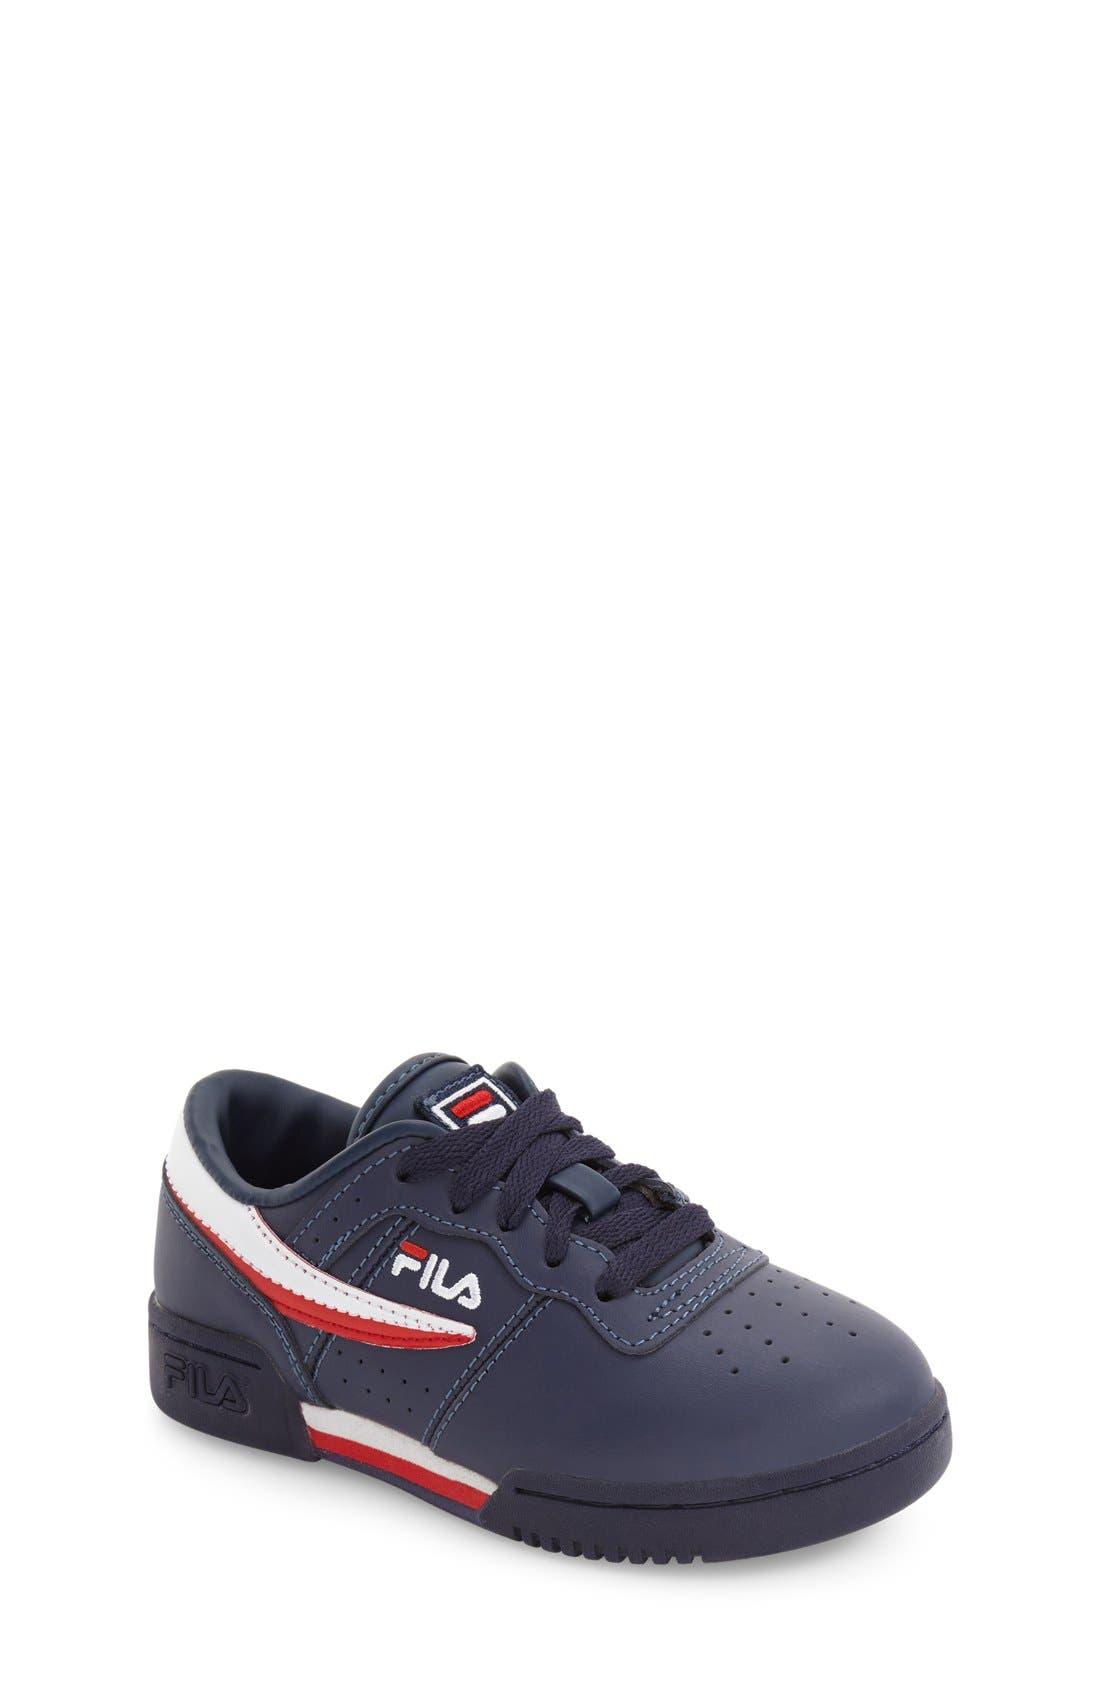 Main Image - FILA Original Sneaker (Toddler, Little Kid & Big Kid)